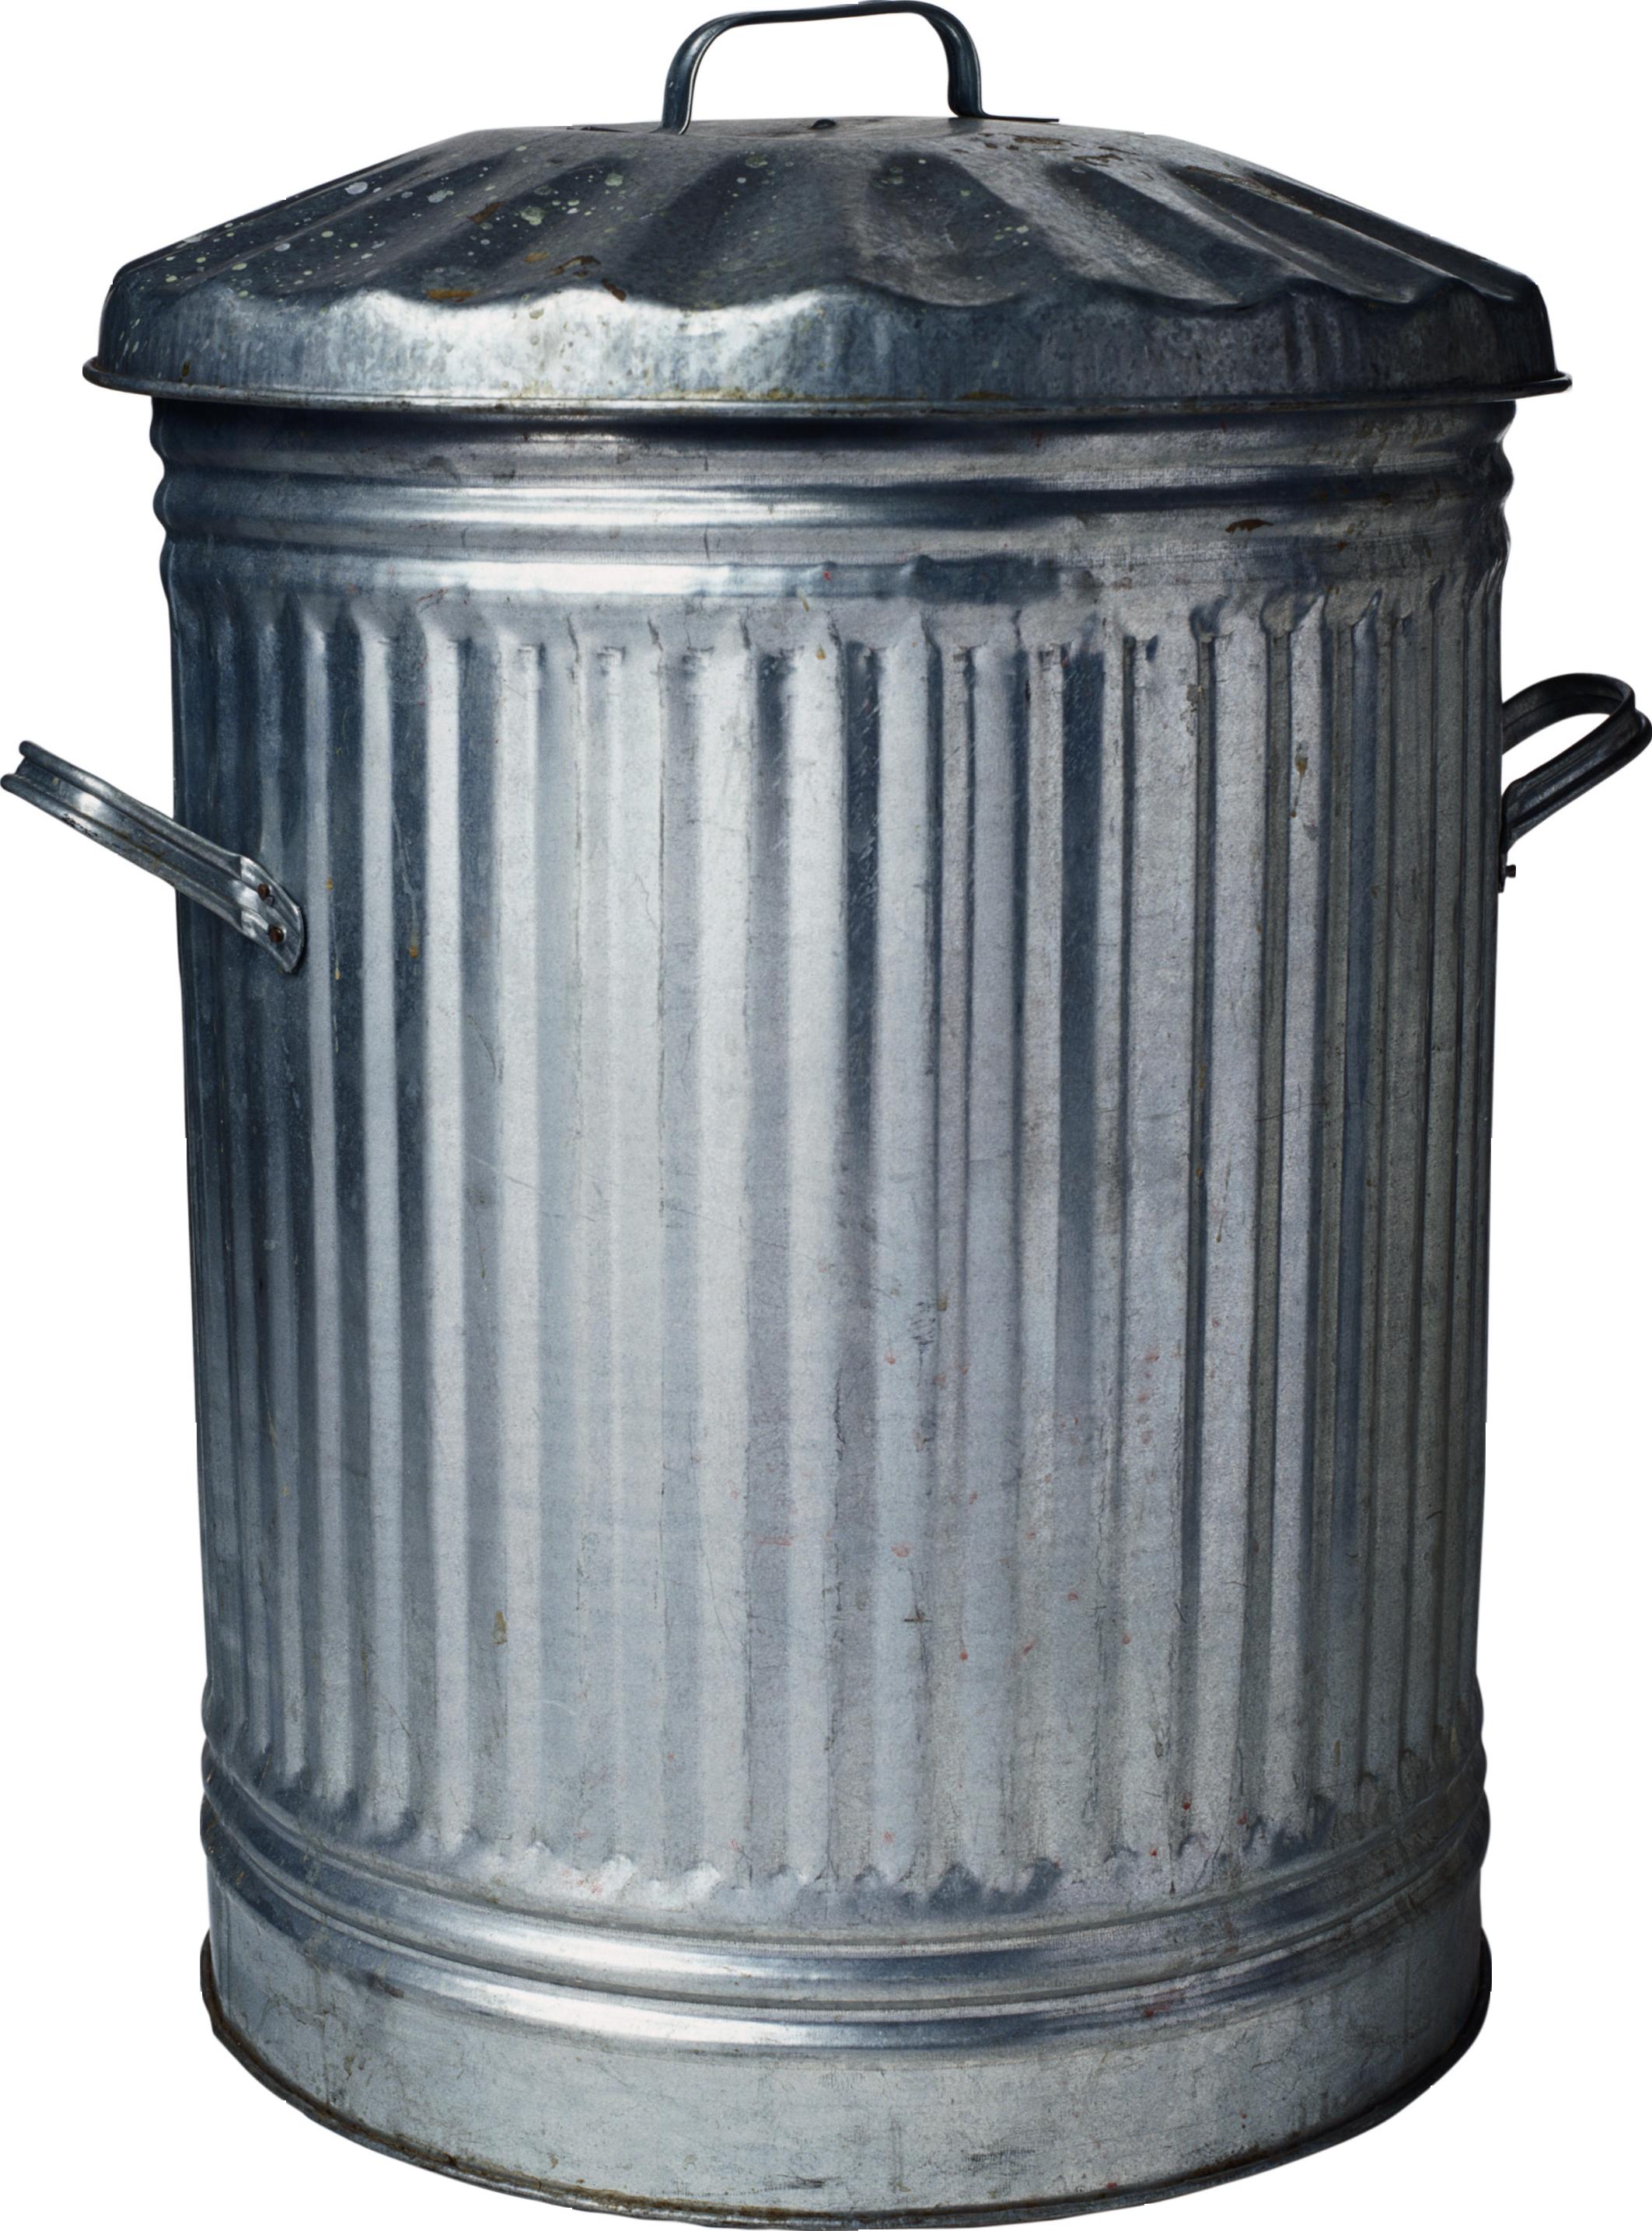 Recycle bin PNG Image